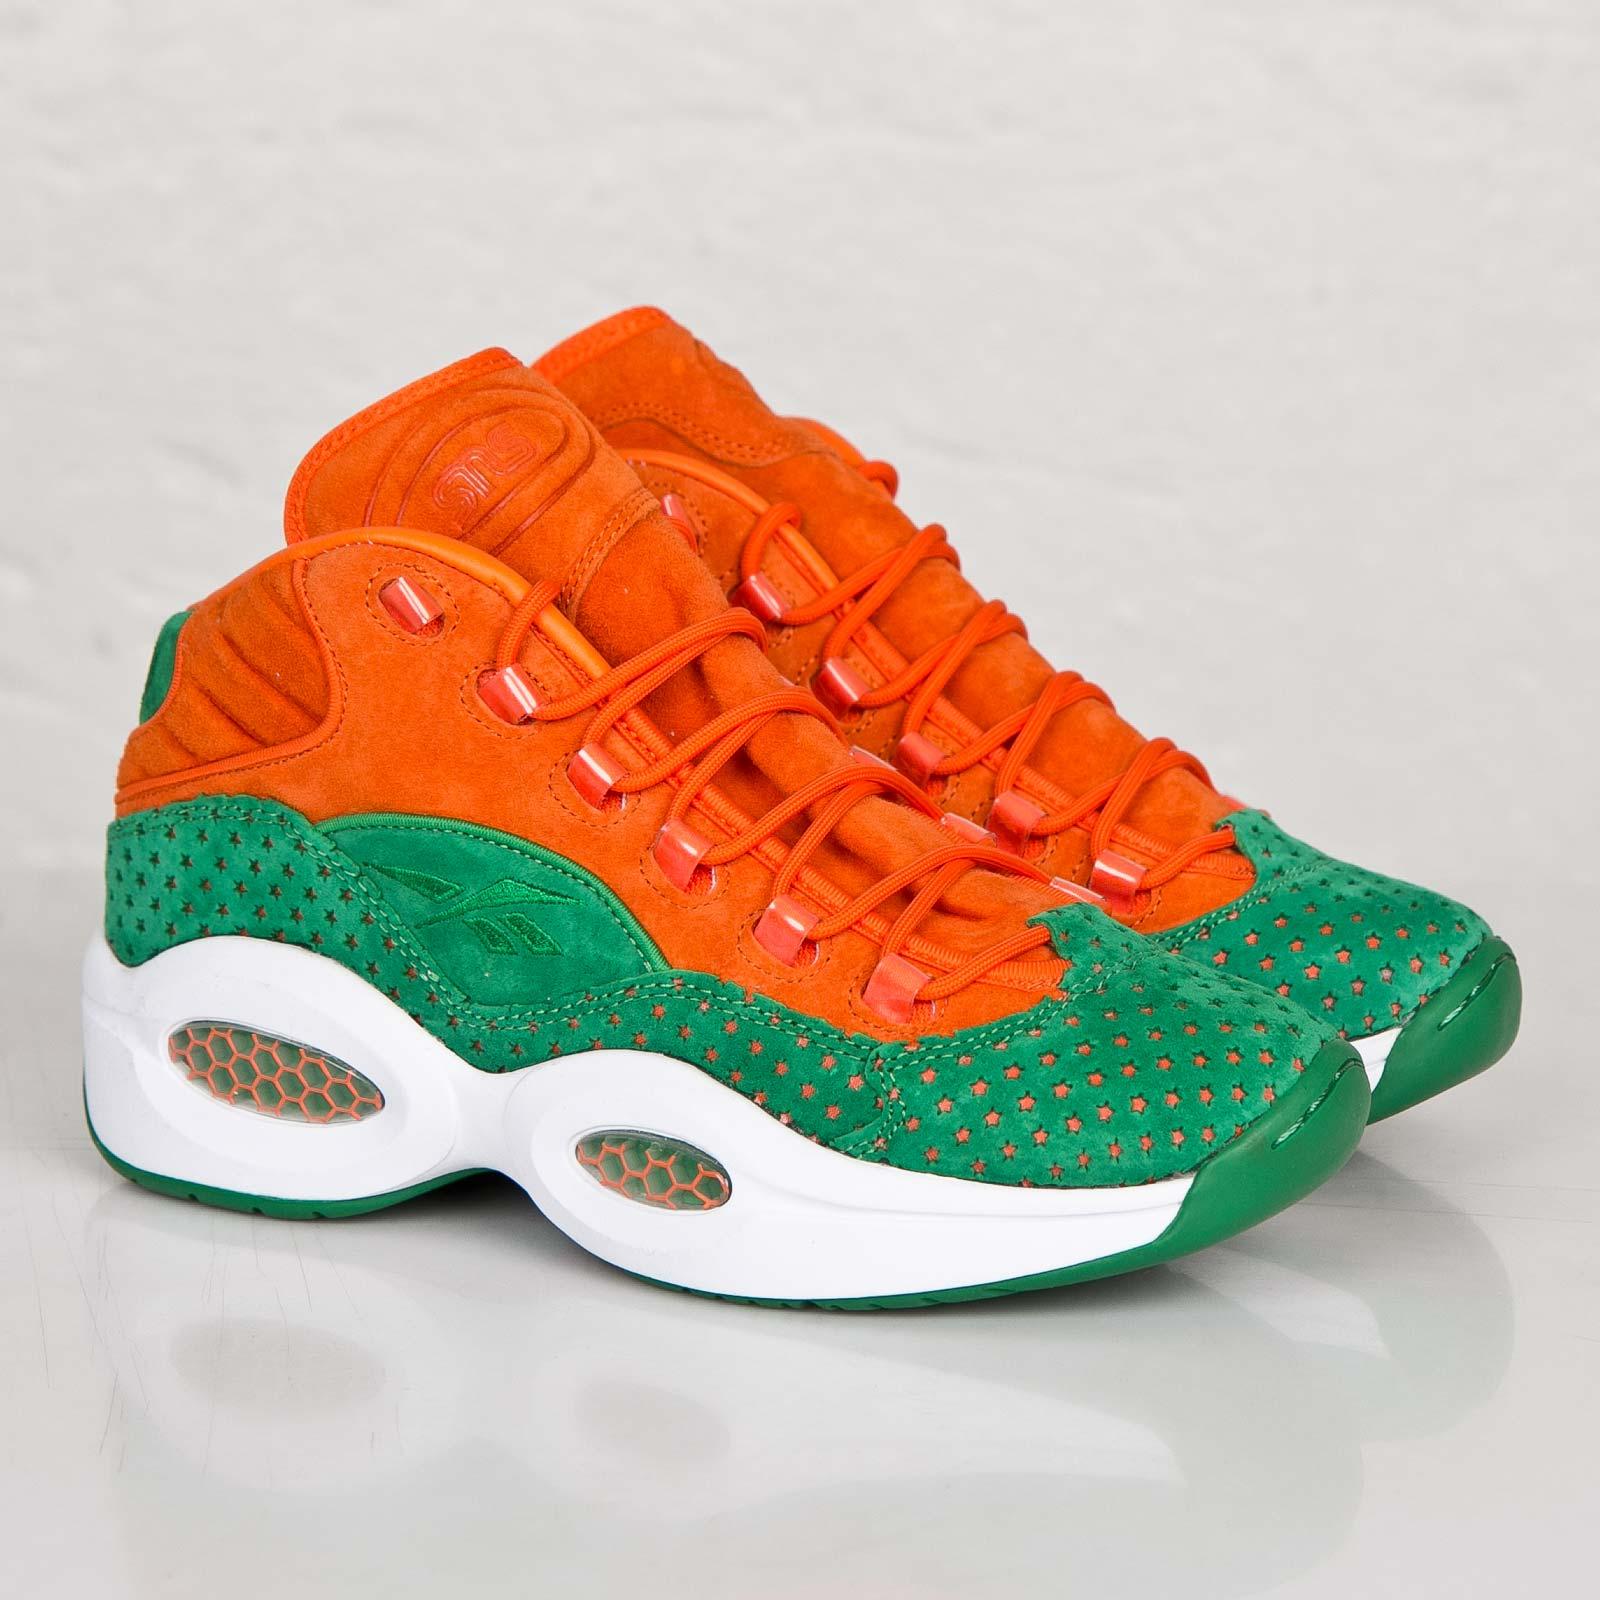 Reebok Question Mid M44914 Sneakersnstuff | sneakers